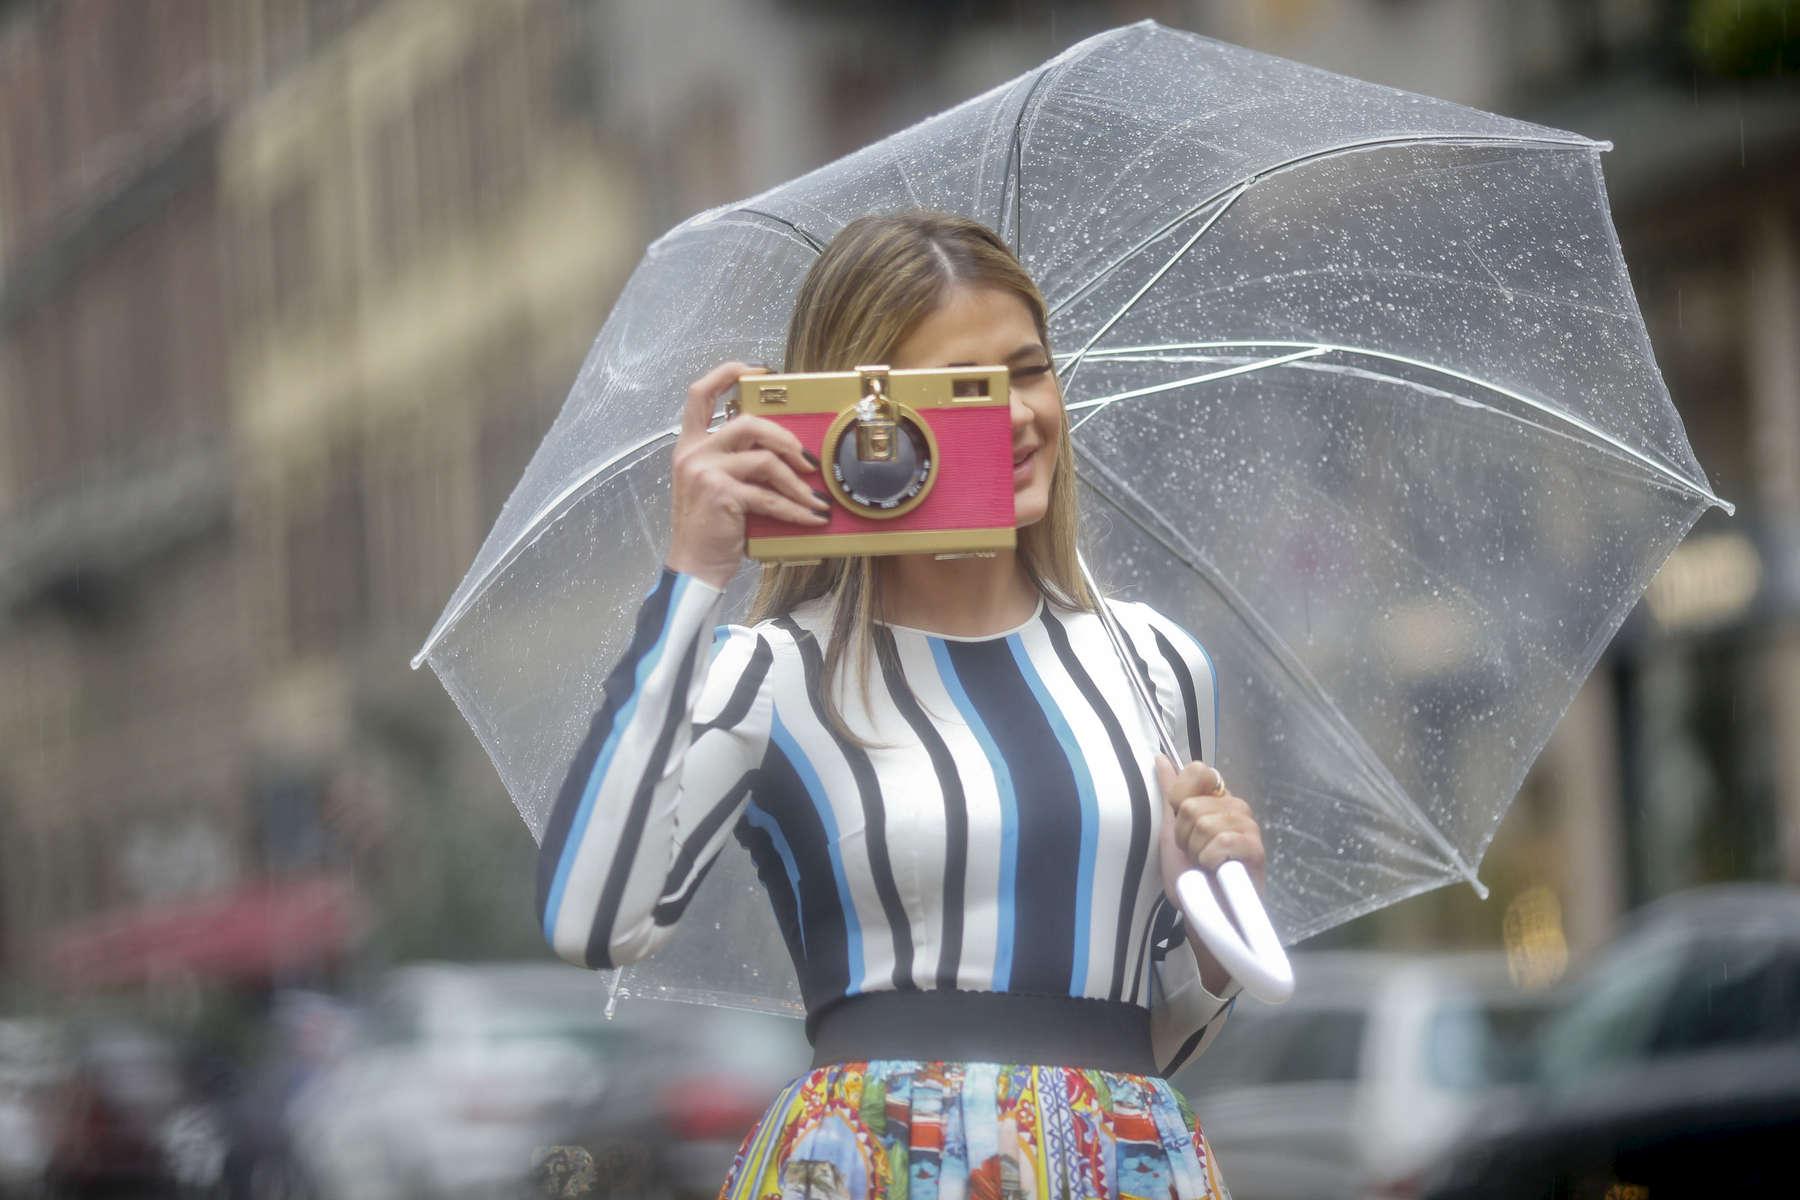 Thassia Naves - Milan Fashion Week, Feb. 2016